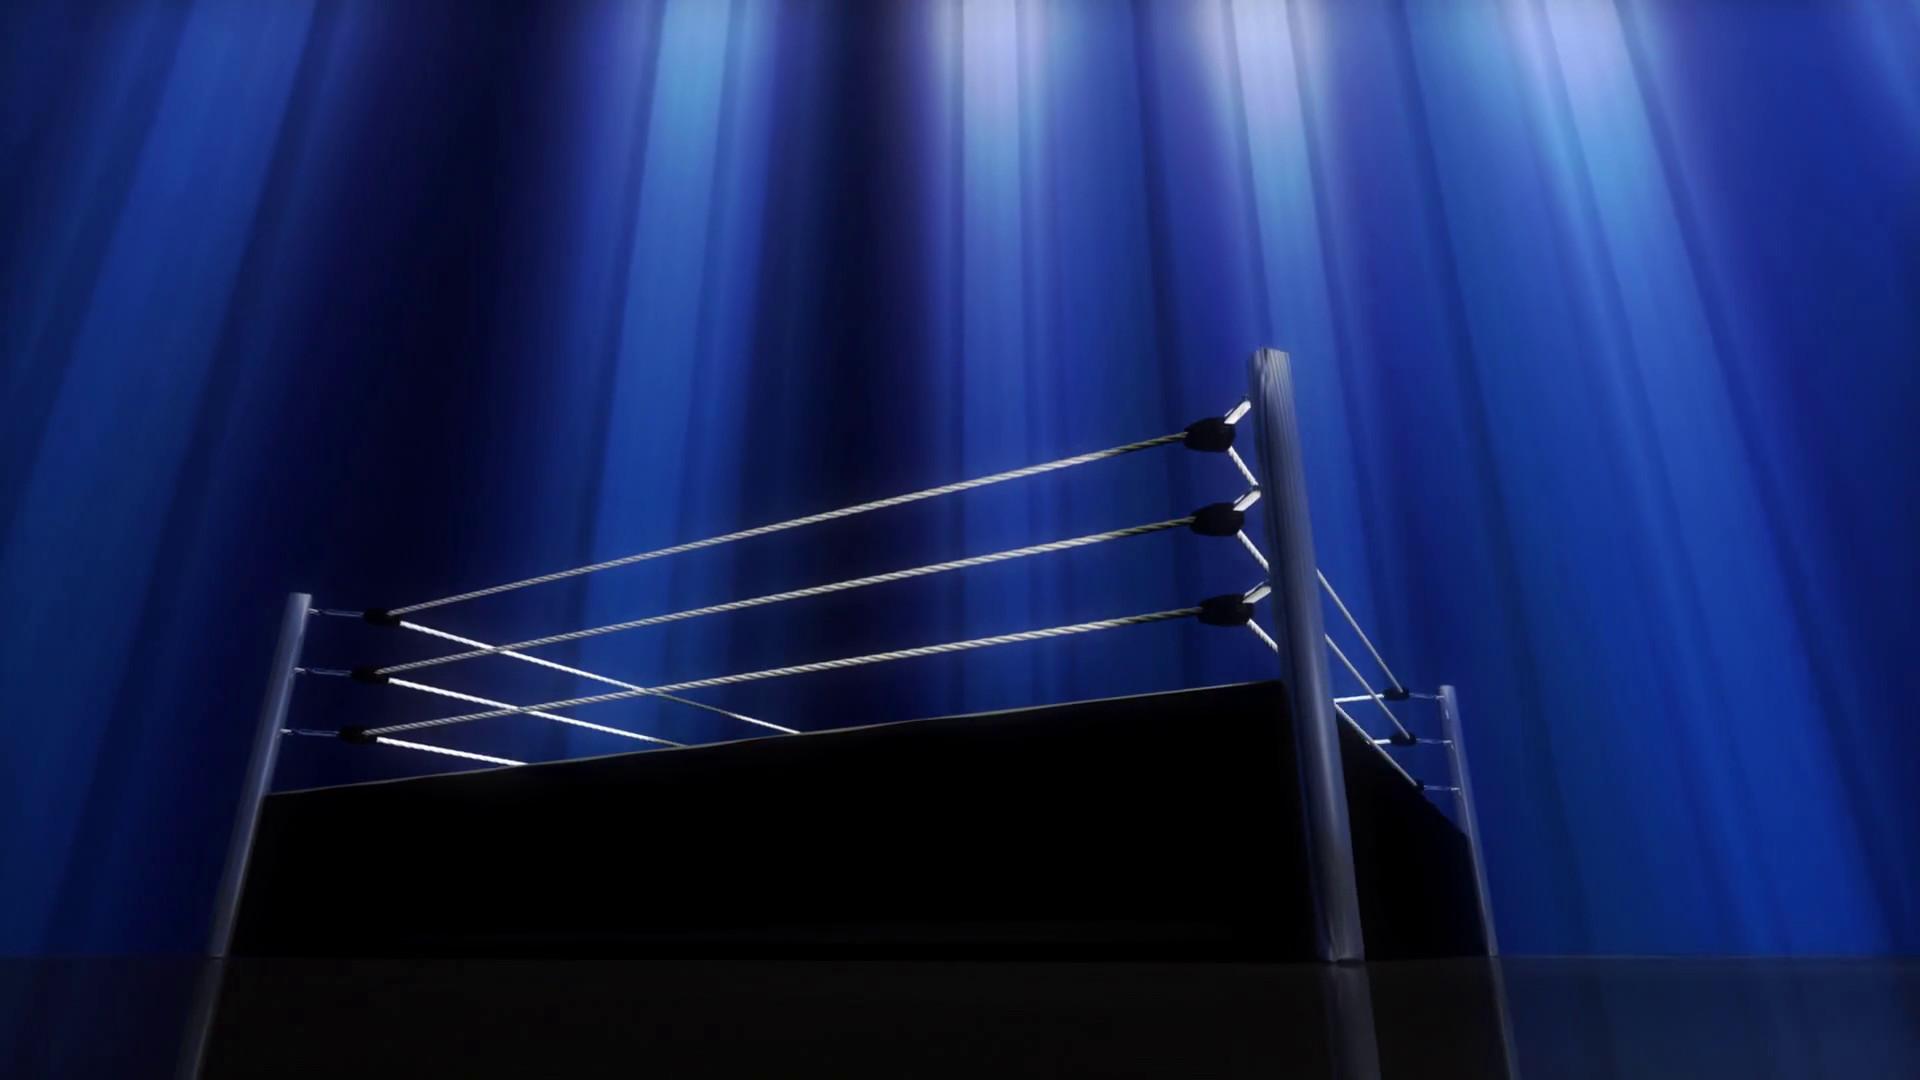 Res: 1920x1080, Blue Light Wrestling Boxing Ring Rotating Background Motion Background -  Videoblocks